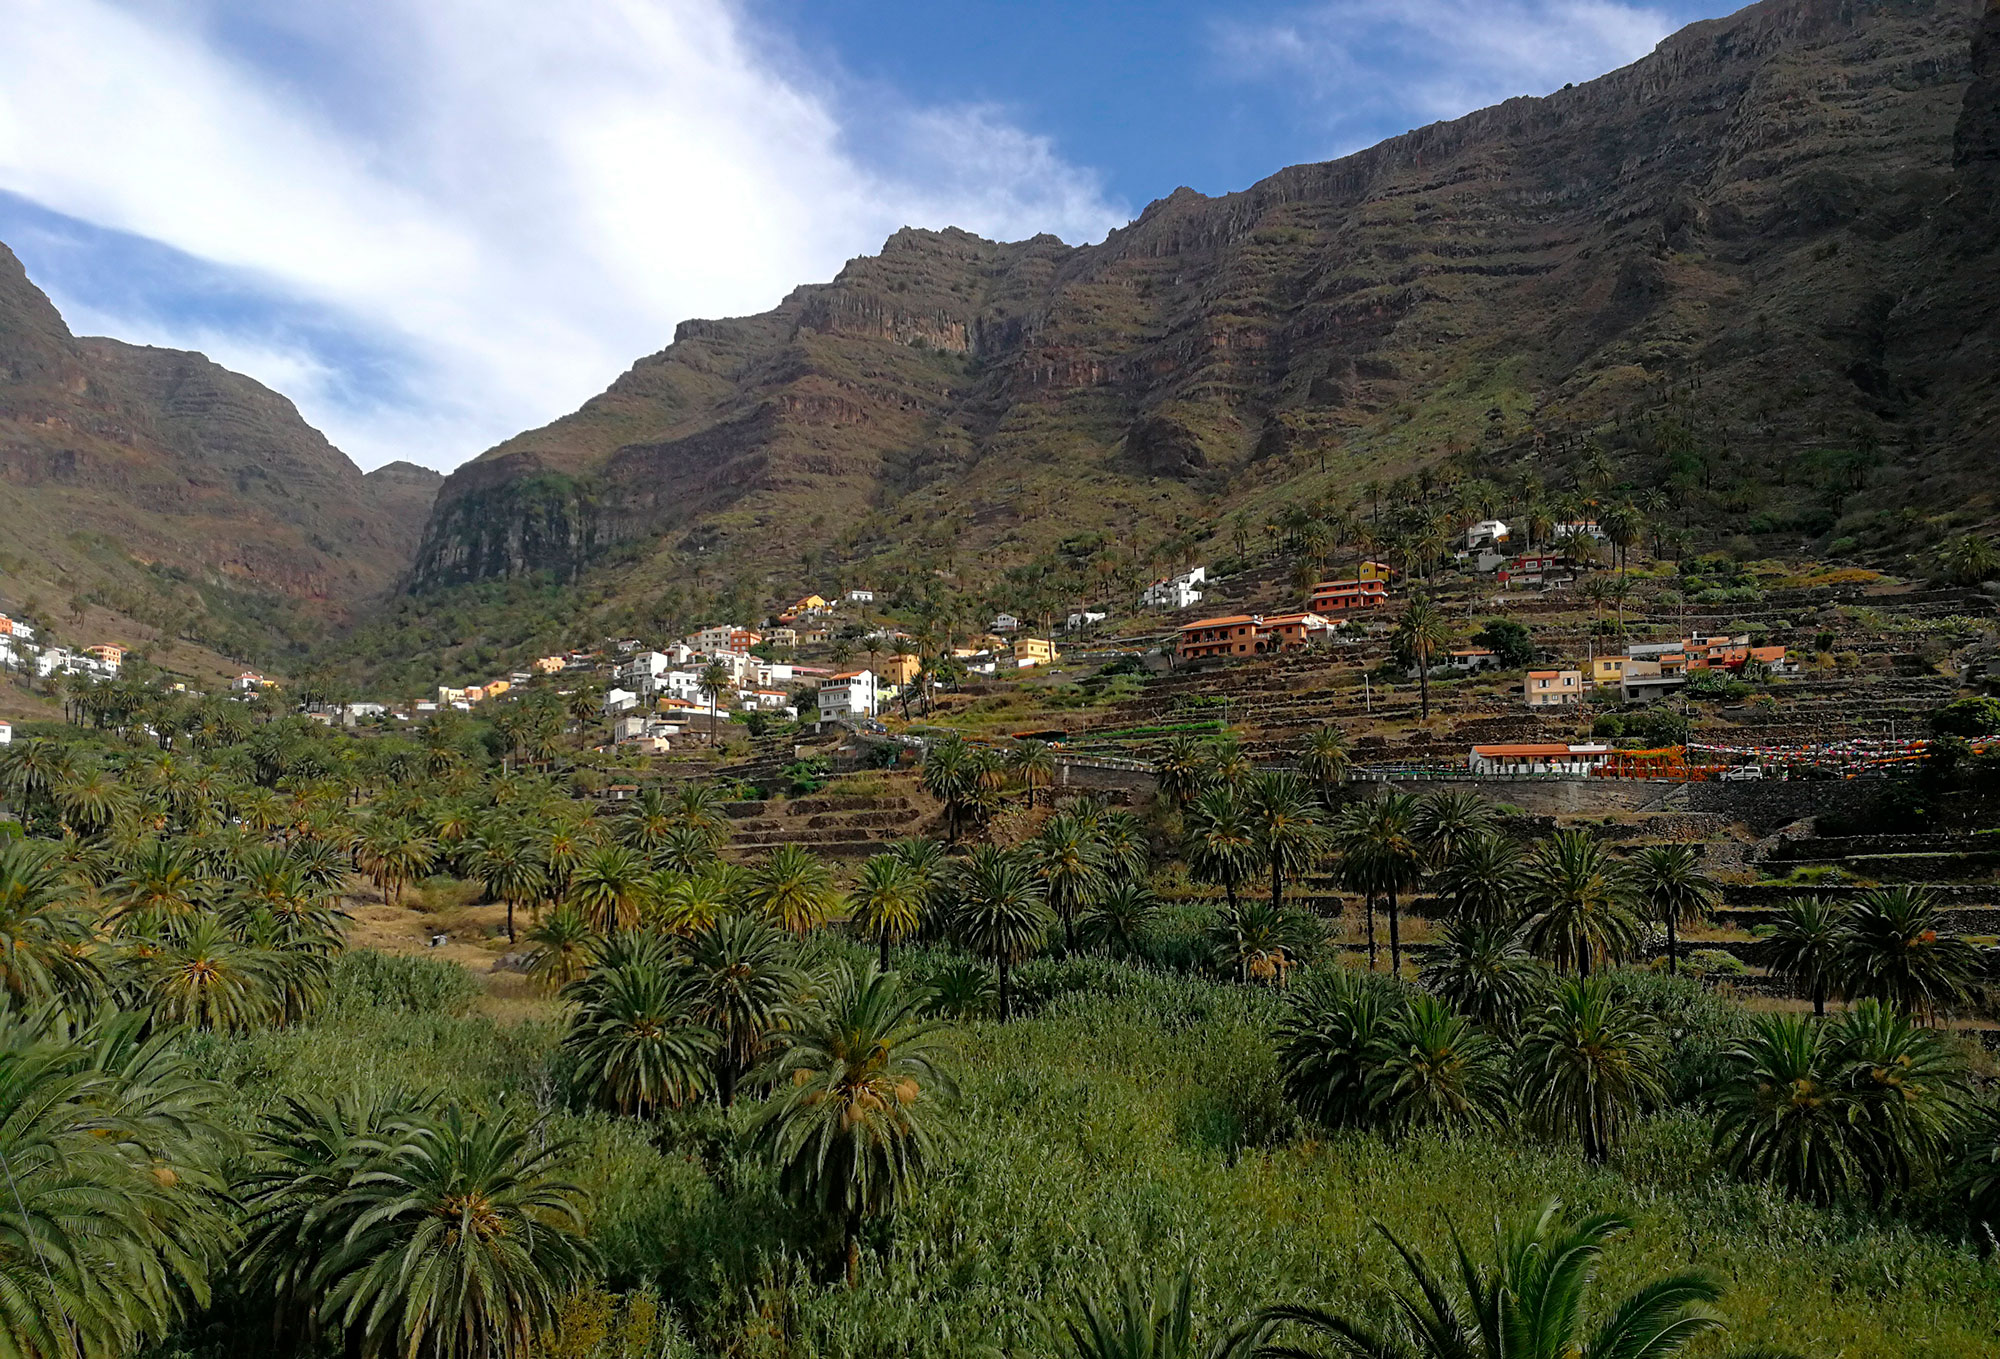 Naturaleza mágica, paisajes increibles, Islas Canarias - España- imagen #2